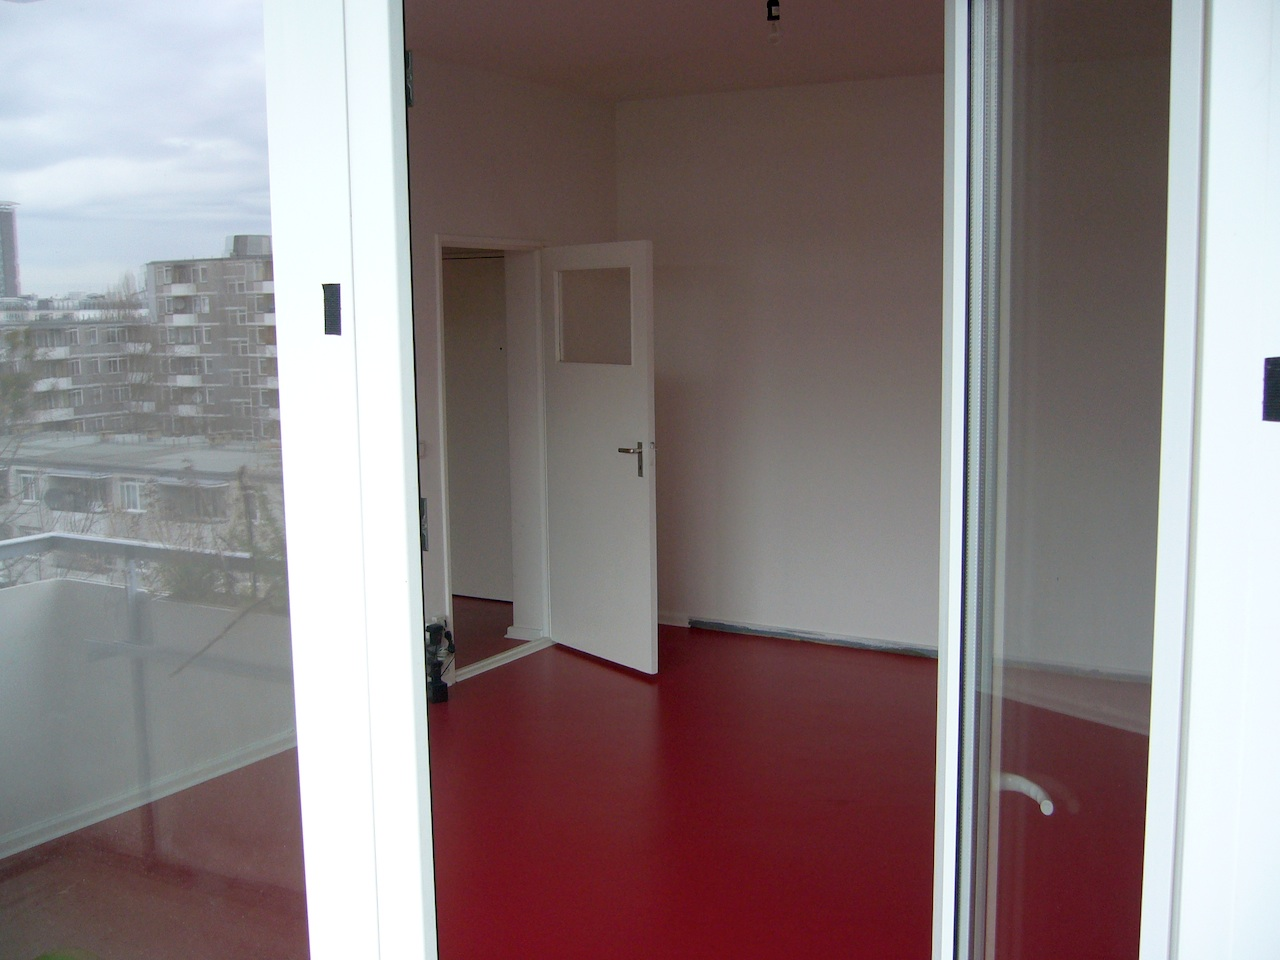 repositorium wohnung in berlin kreuzberg frei. Black Bedroom Furniture Sets. Home Design Ideas